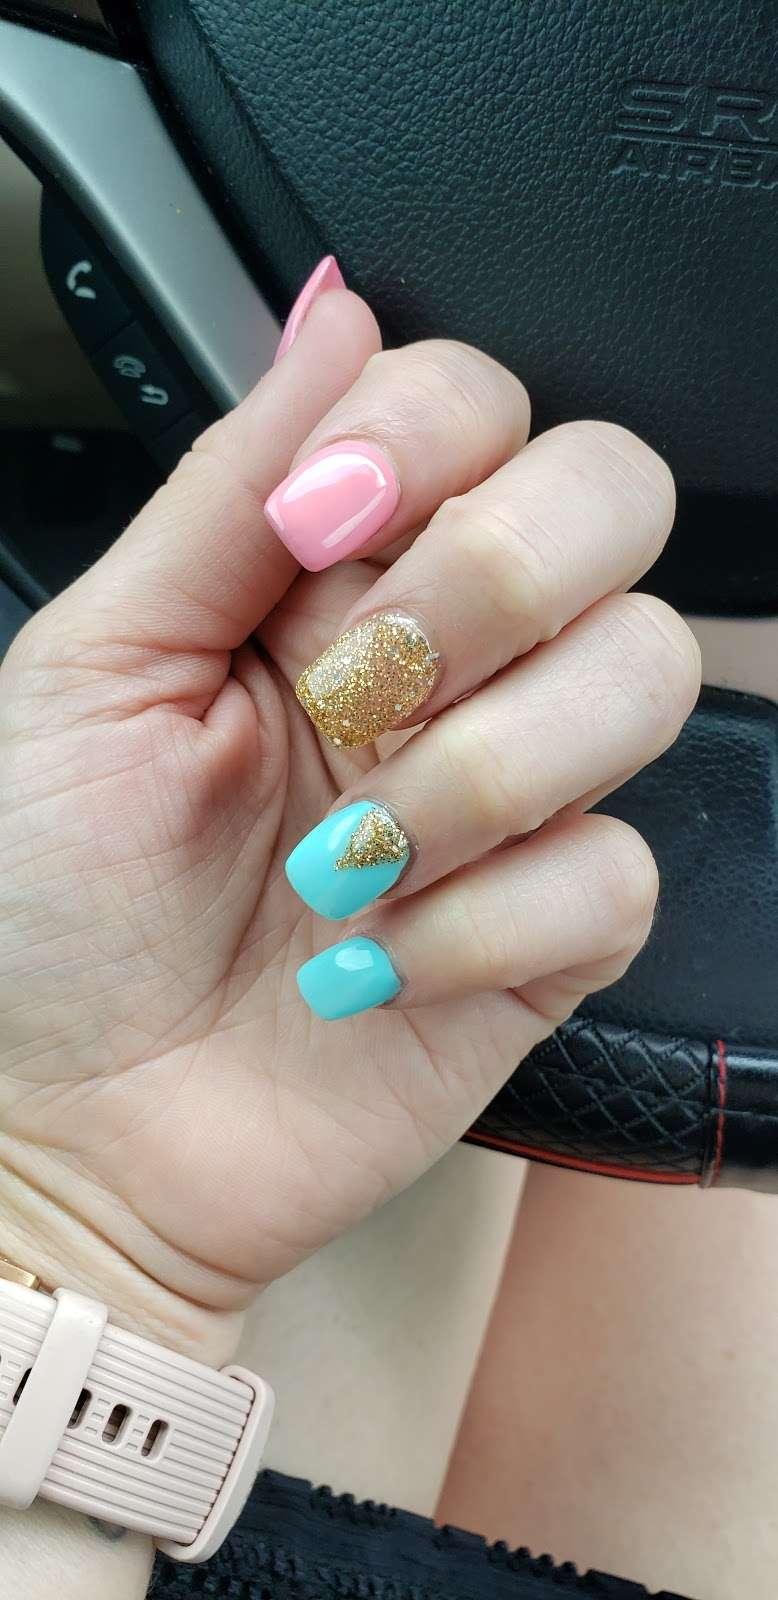 VIP Nails and Spa - spa    Photo 3 of 6   Address: 4713 E, FL-44, Wildwood, FL 34785, USA   Phone: (352) 661-3263